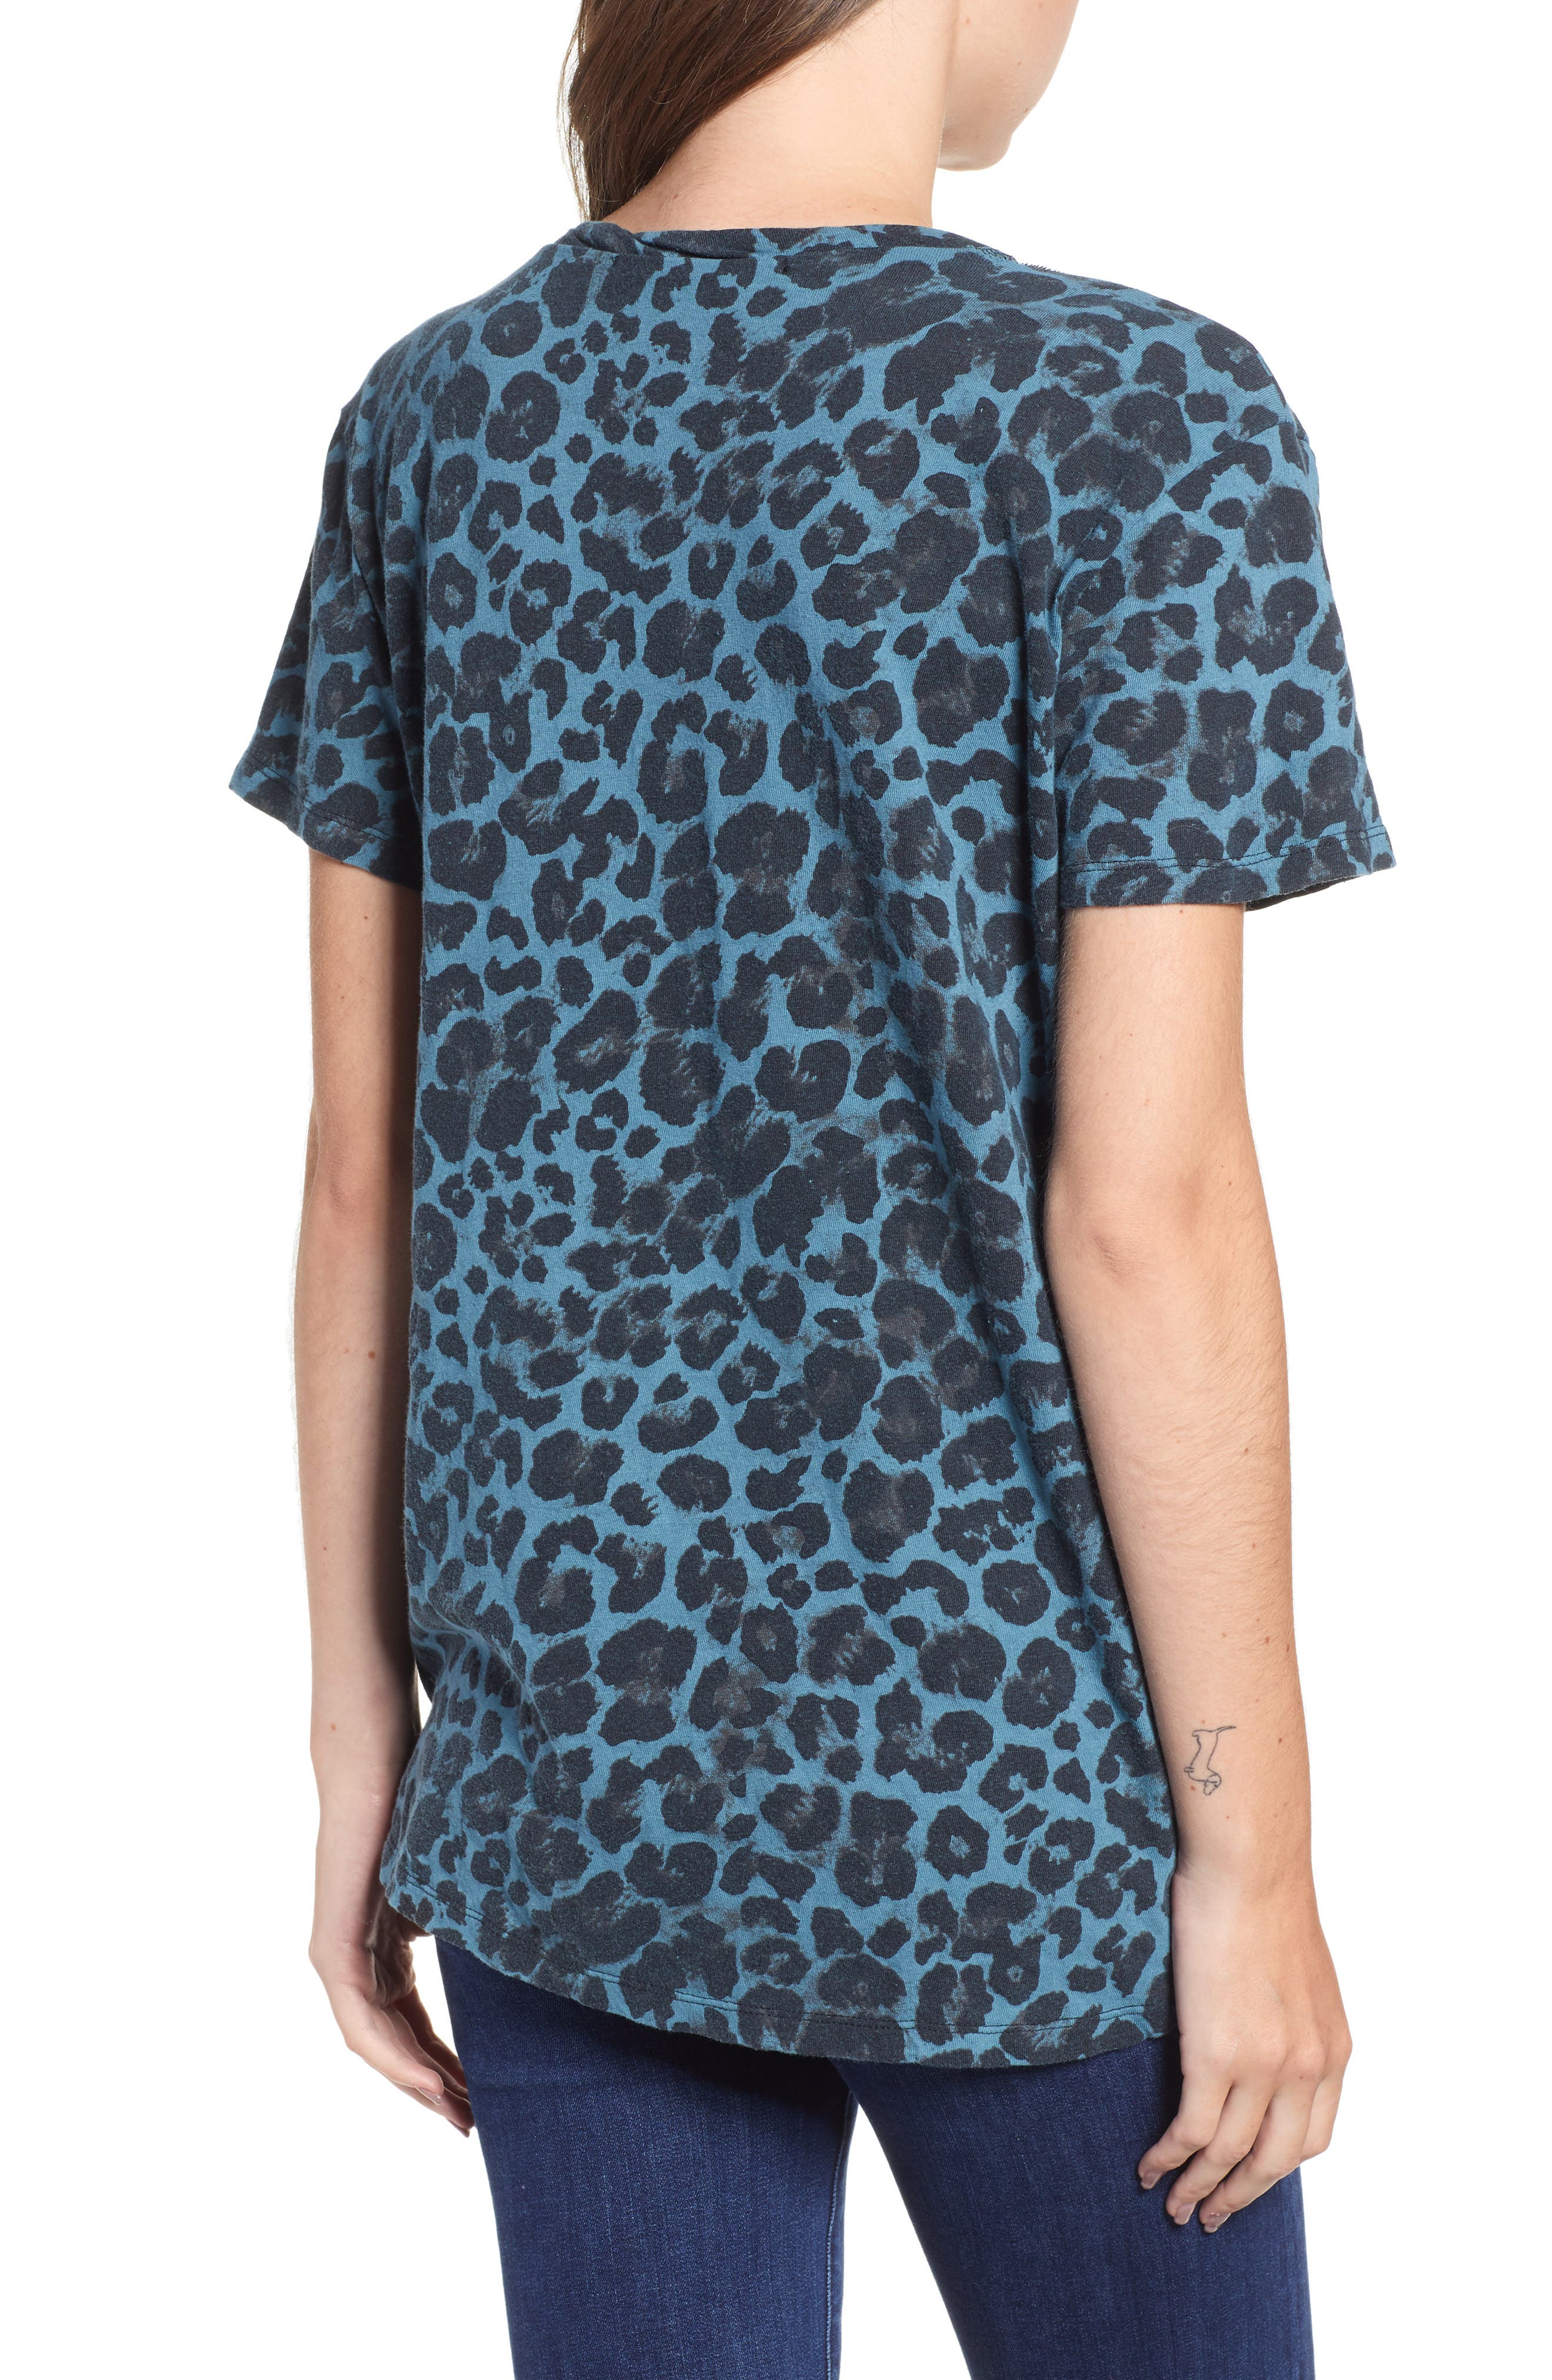 Leopard Print Cutout Tee,                             Alternate thumbnail 2, color,                             BLUE LEOPARD PRINT